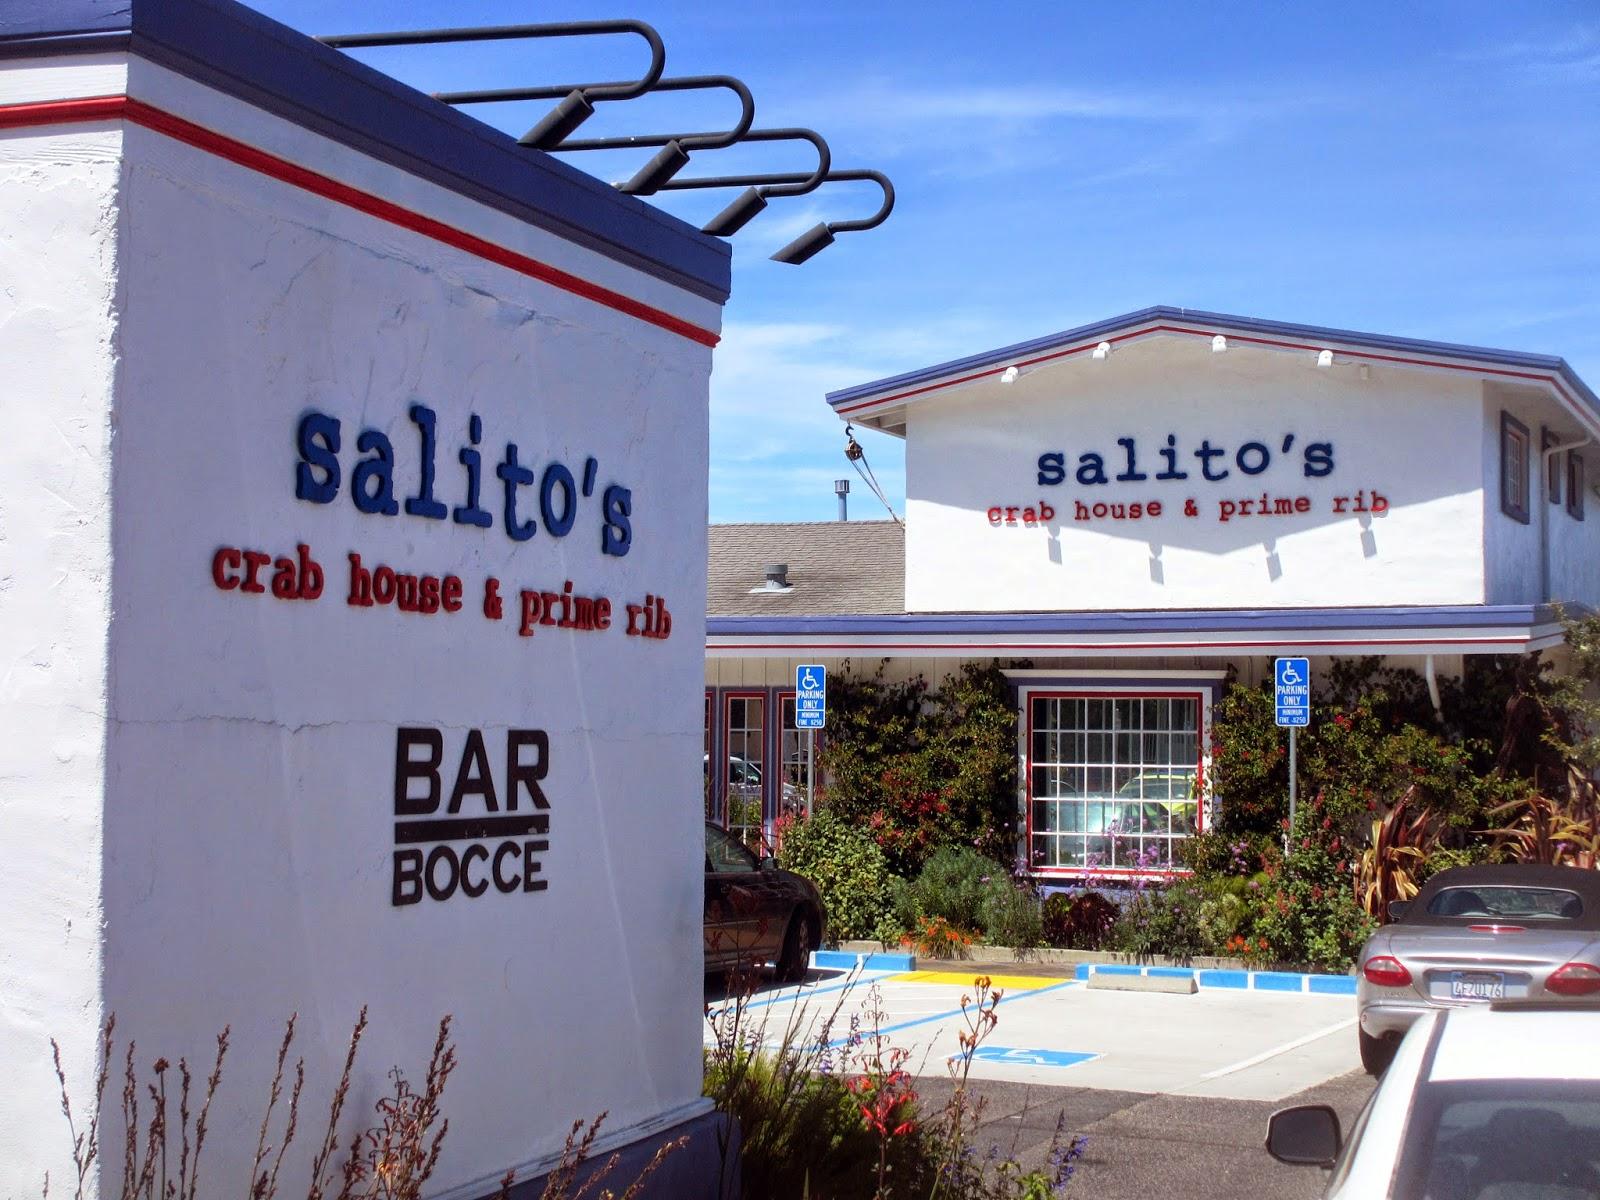 SALITO'S CRAB HOUSE